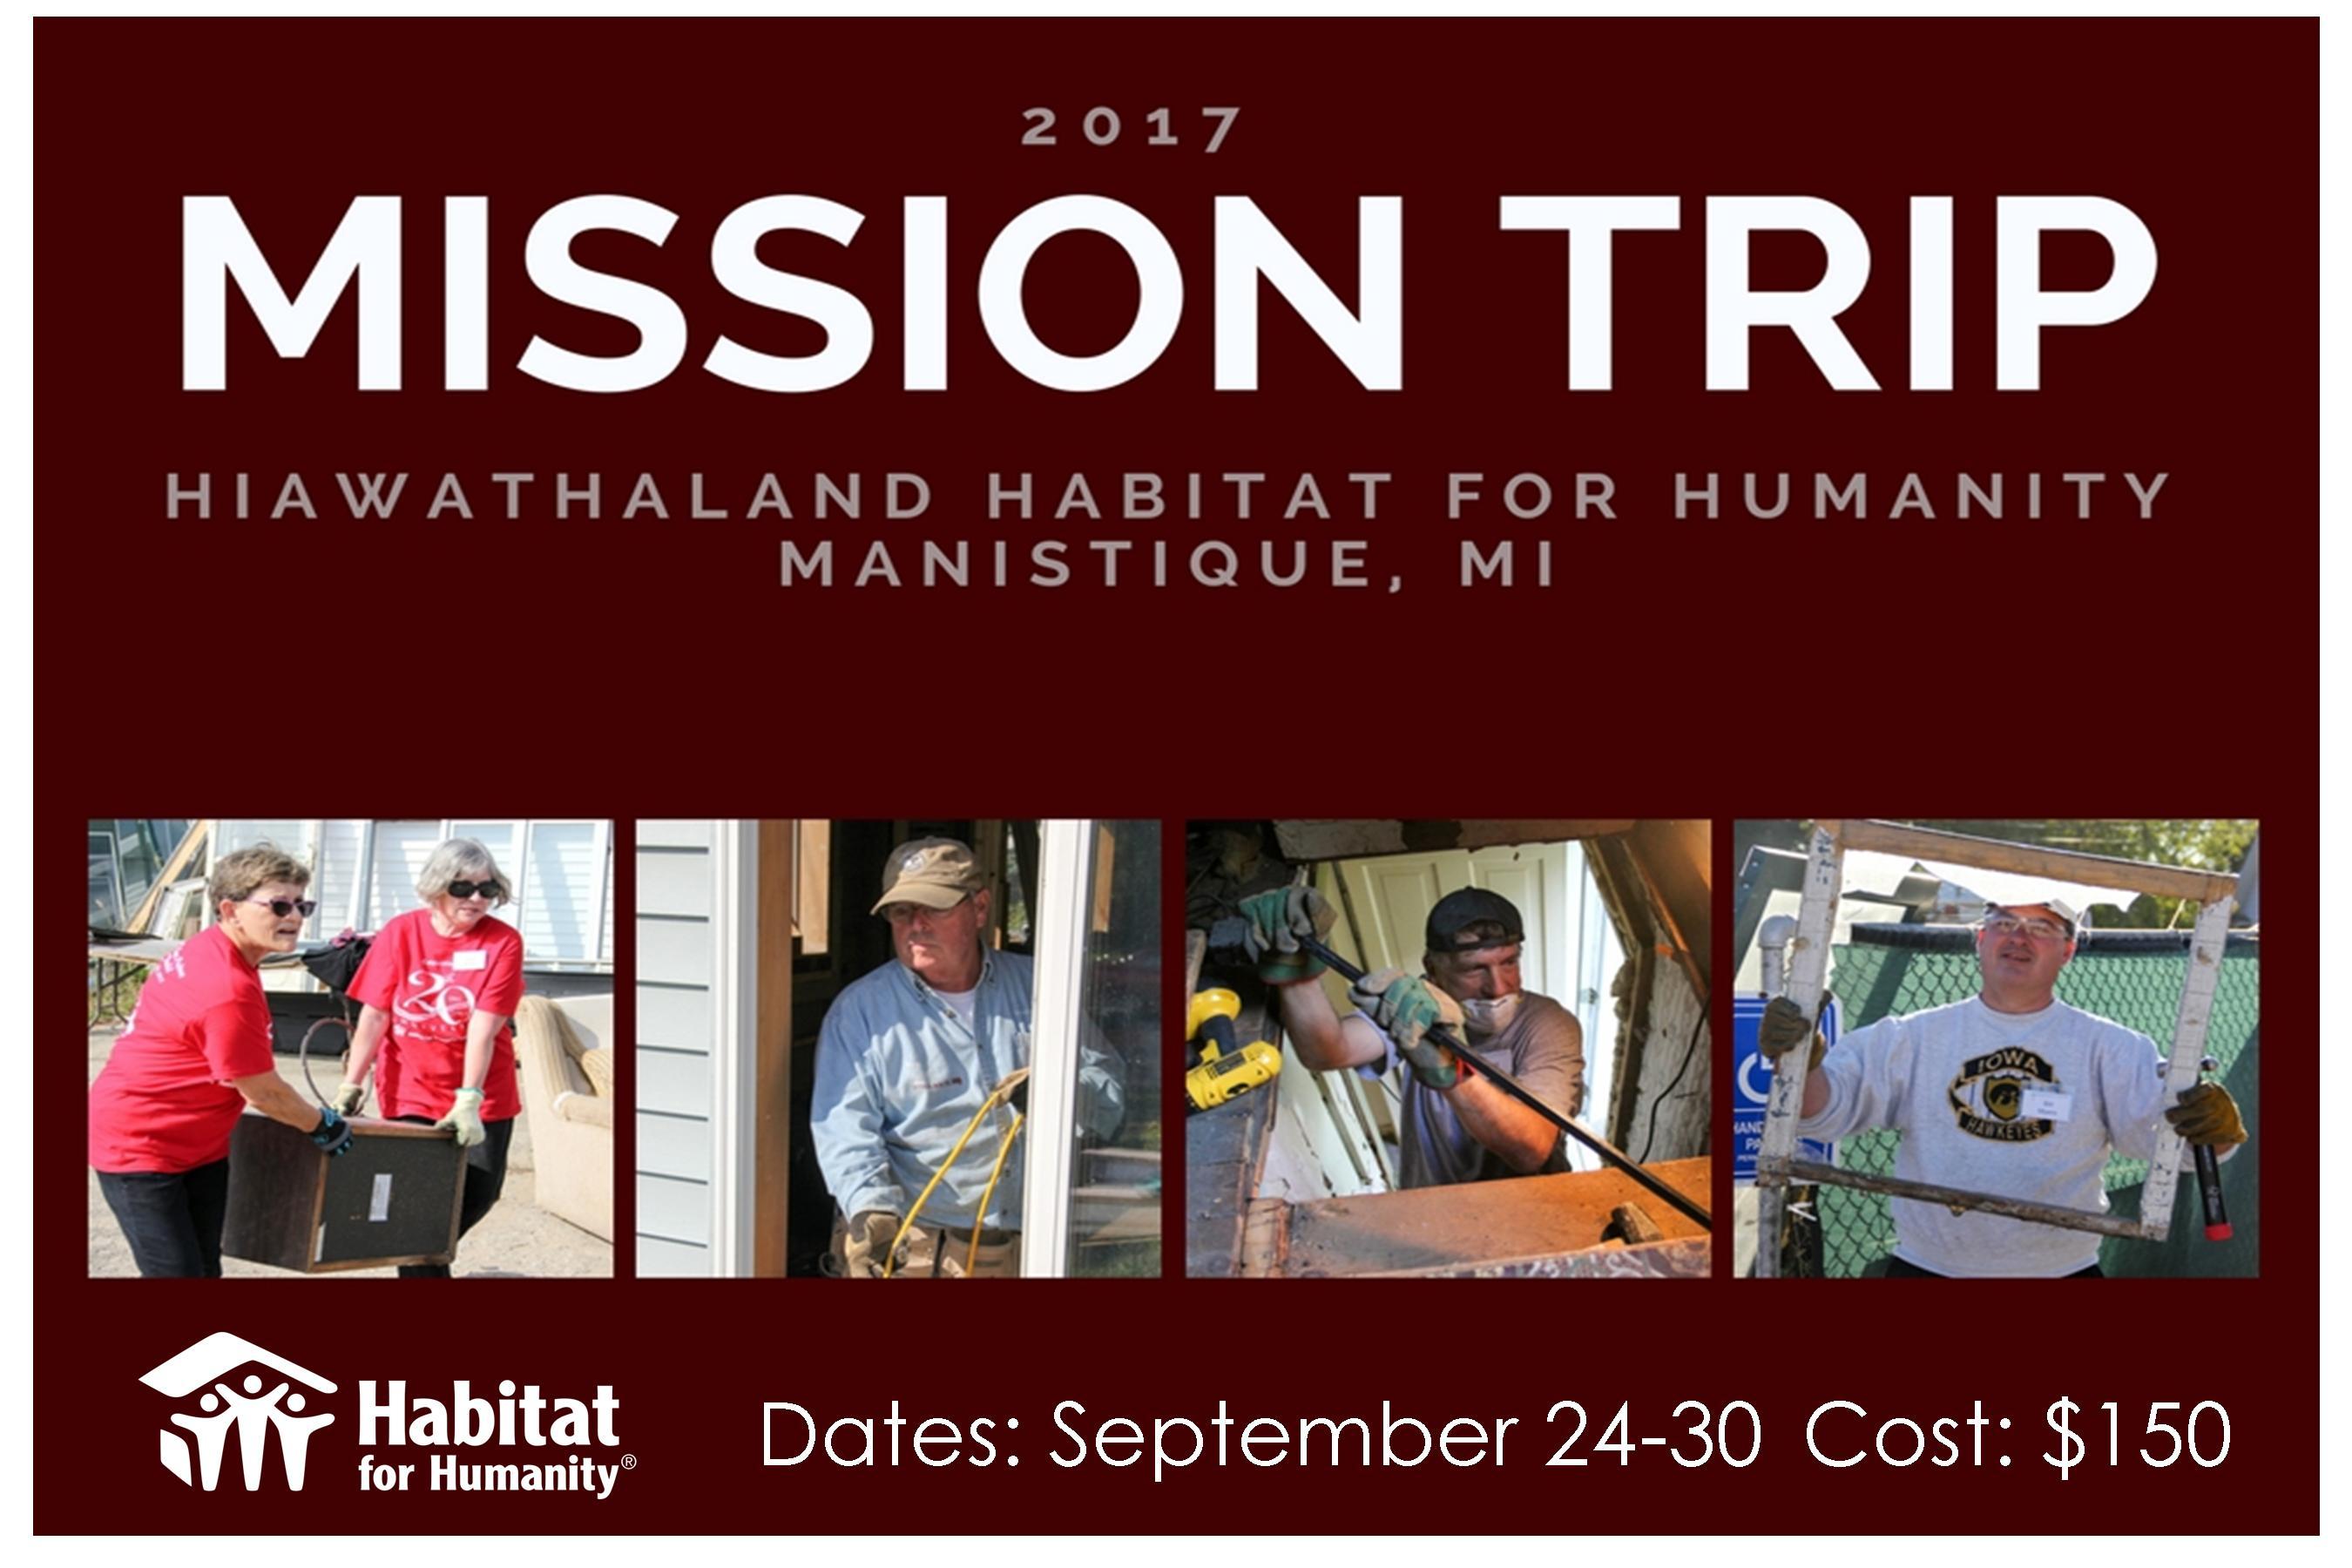 2017-HiawathaLand-Mission-Trip-poster-3